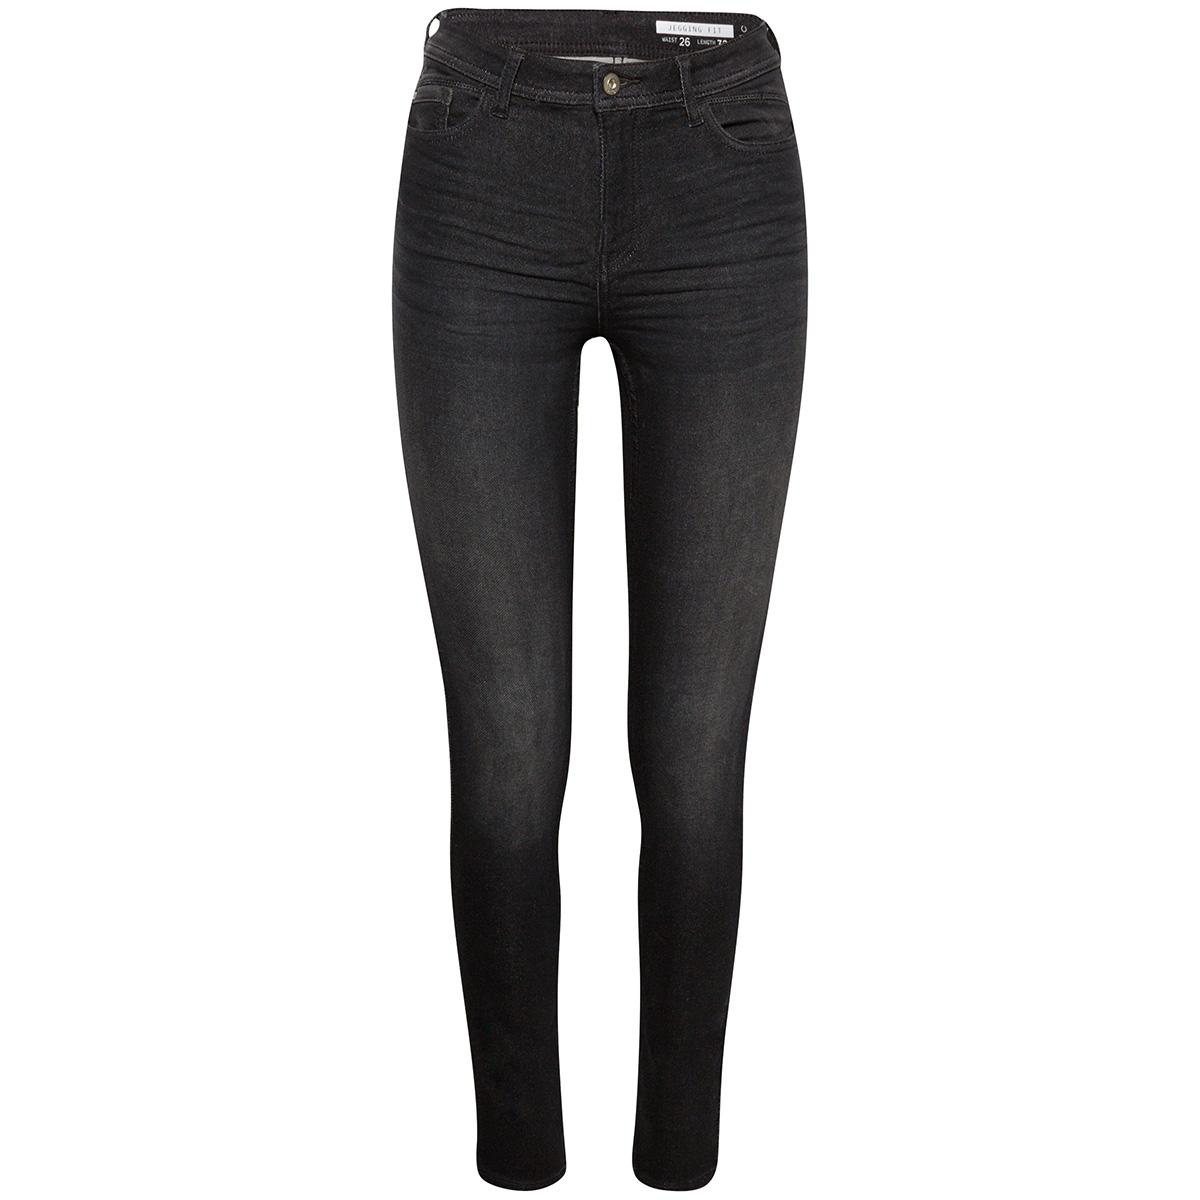 108cc1b013 edc jeans c911